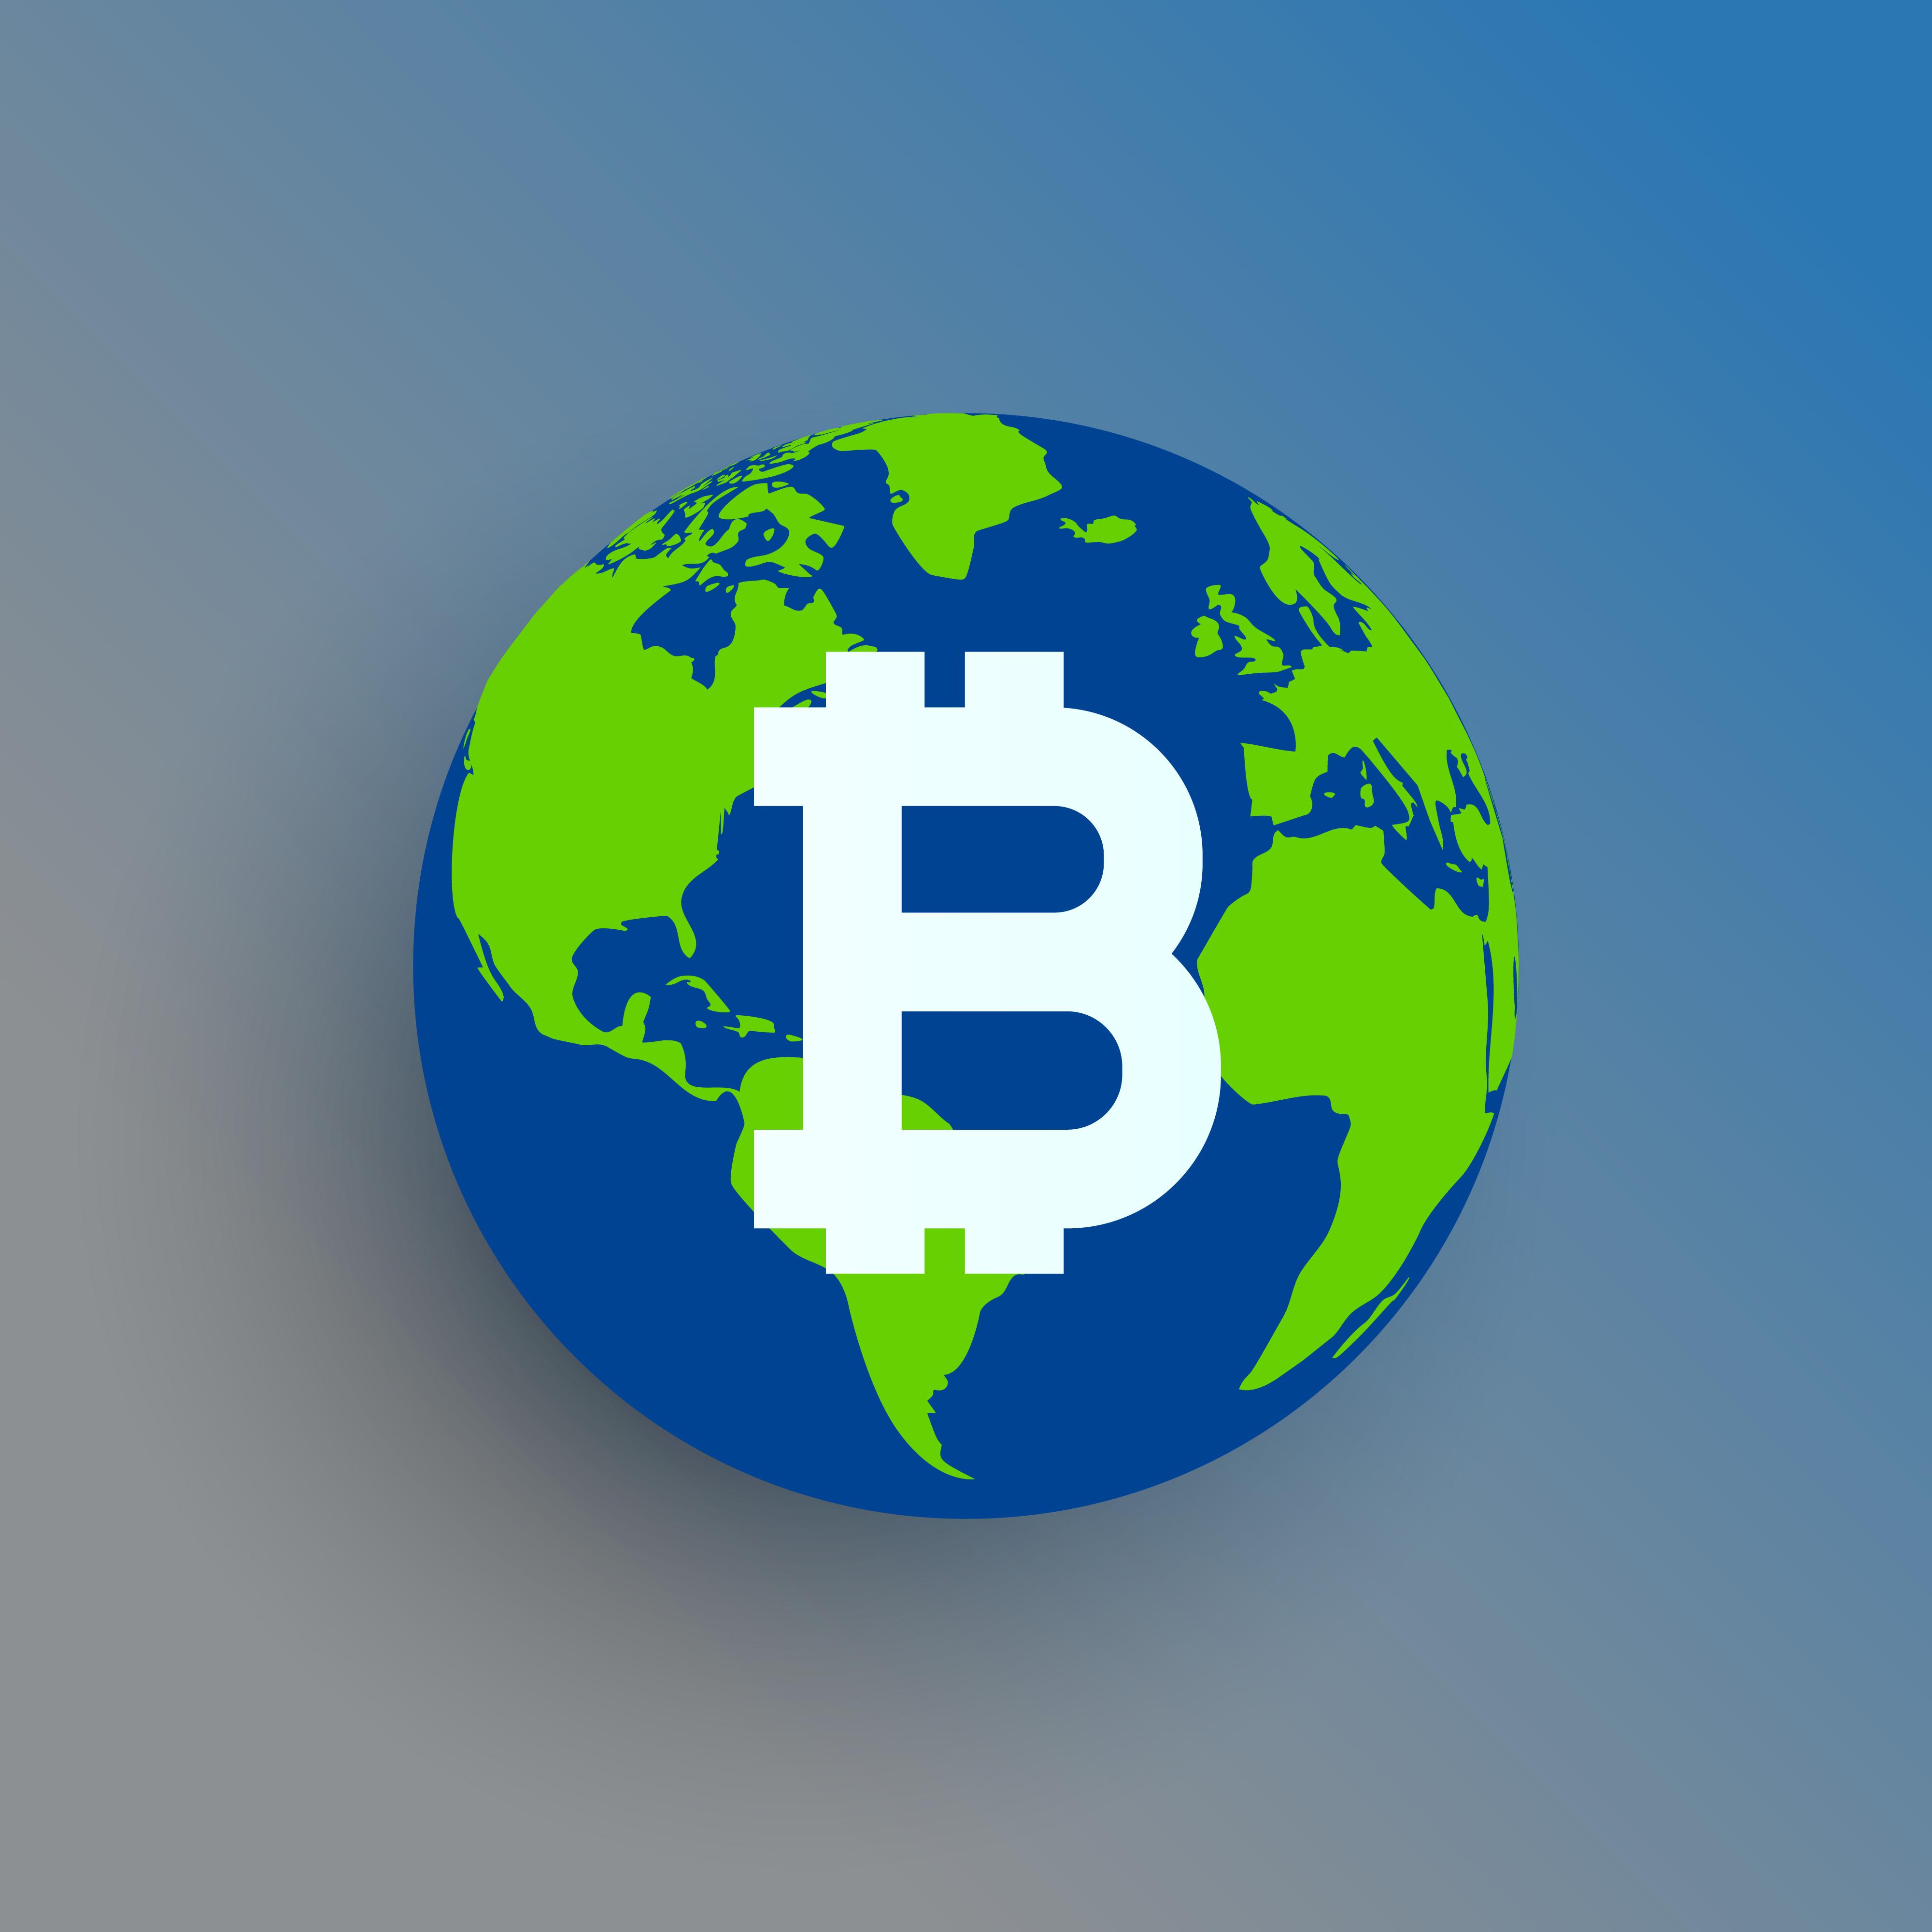 Bitcoin Symbol On World Map